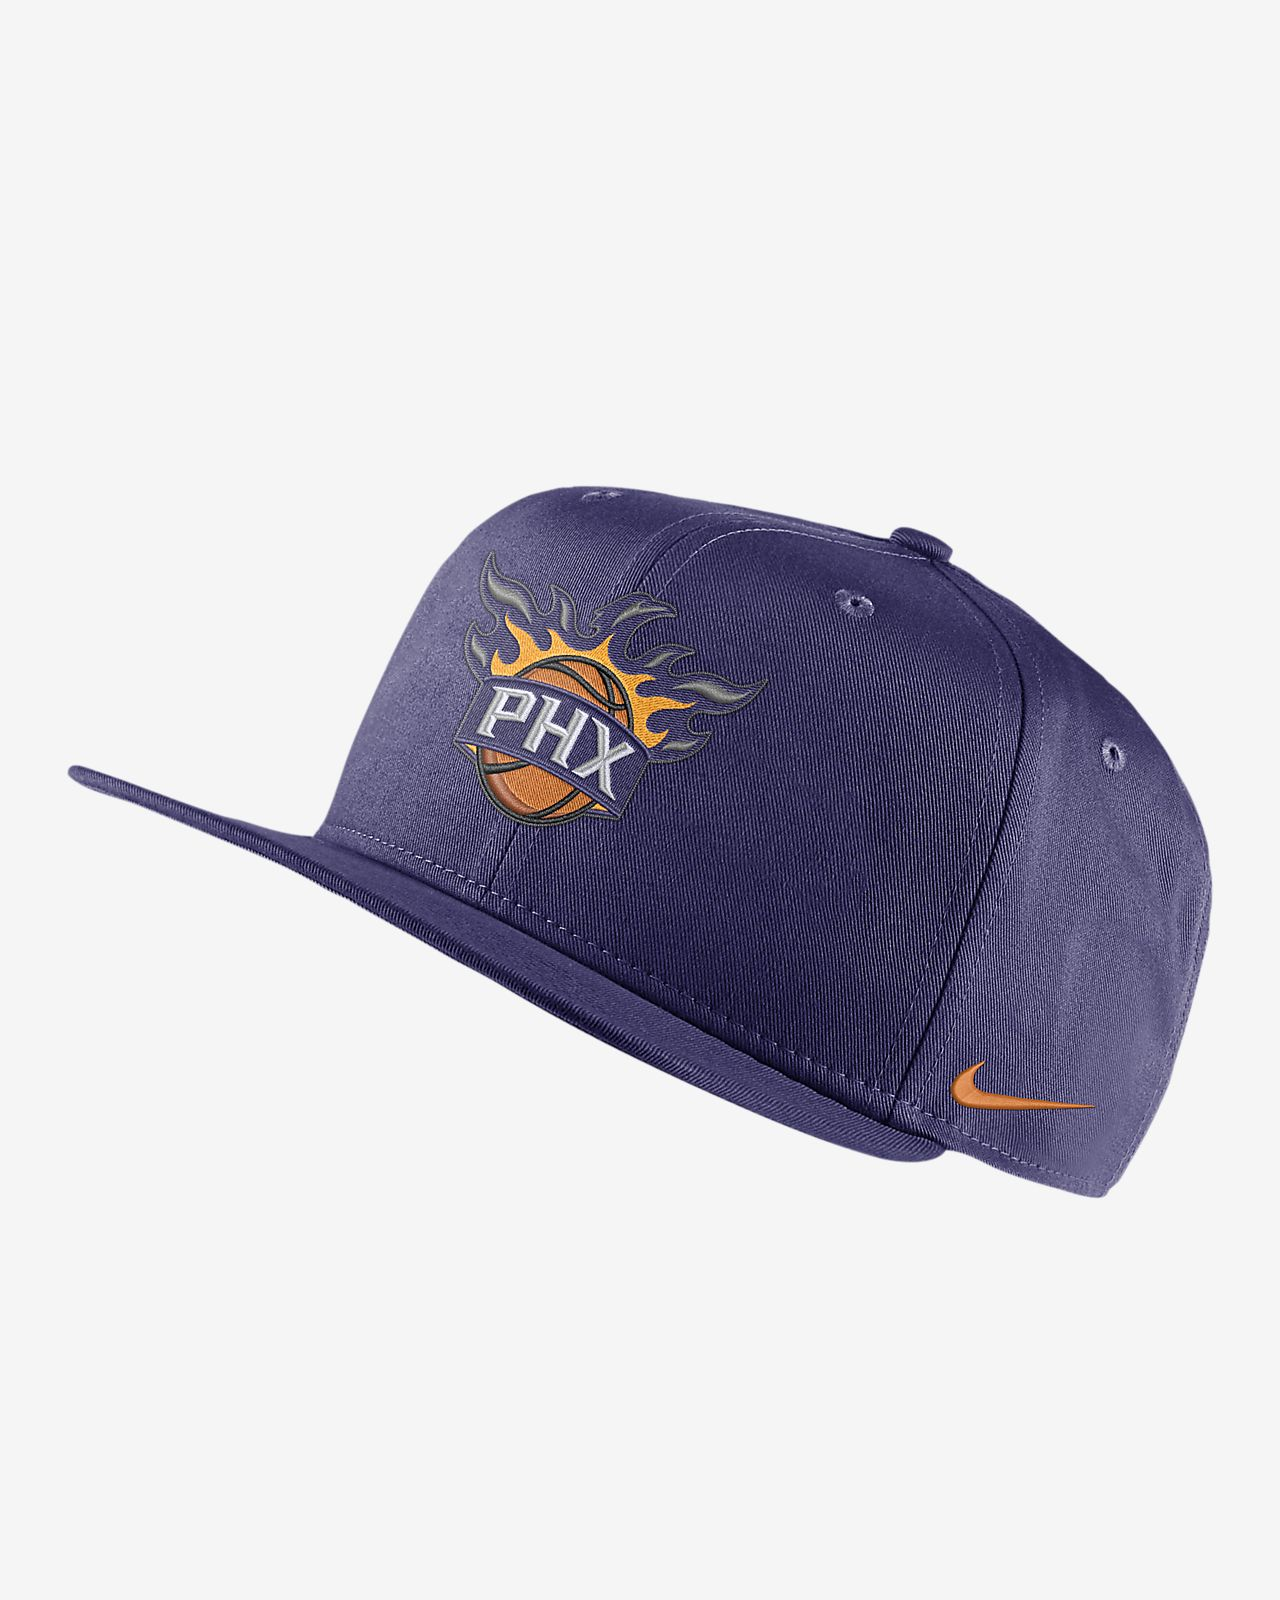 Gorra de la NBA Phoenix Suns Nike Pro